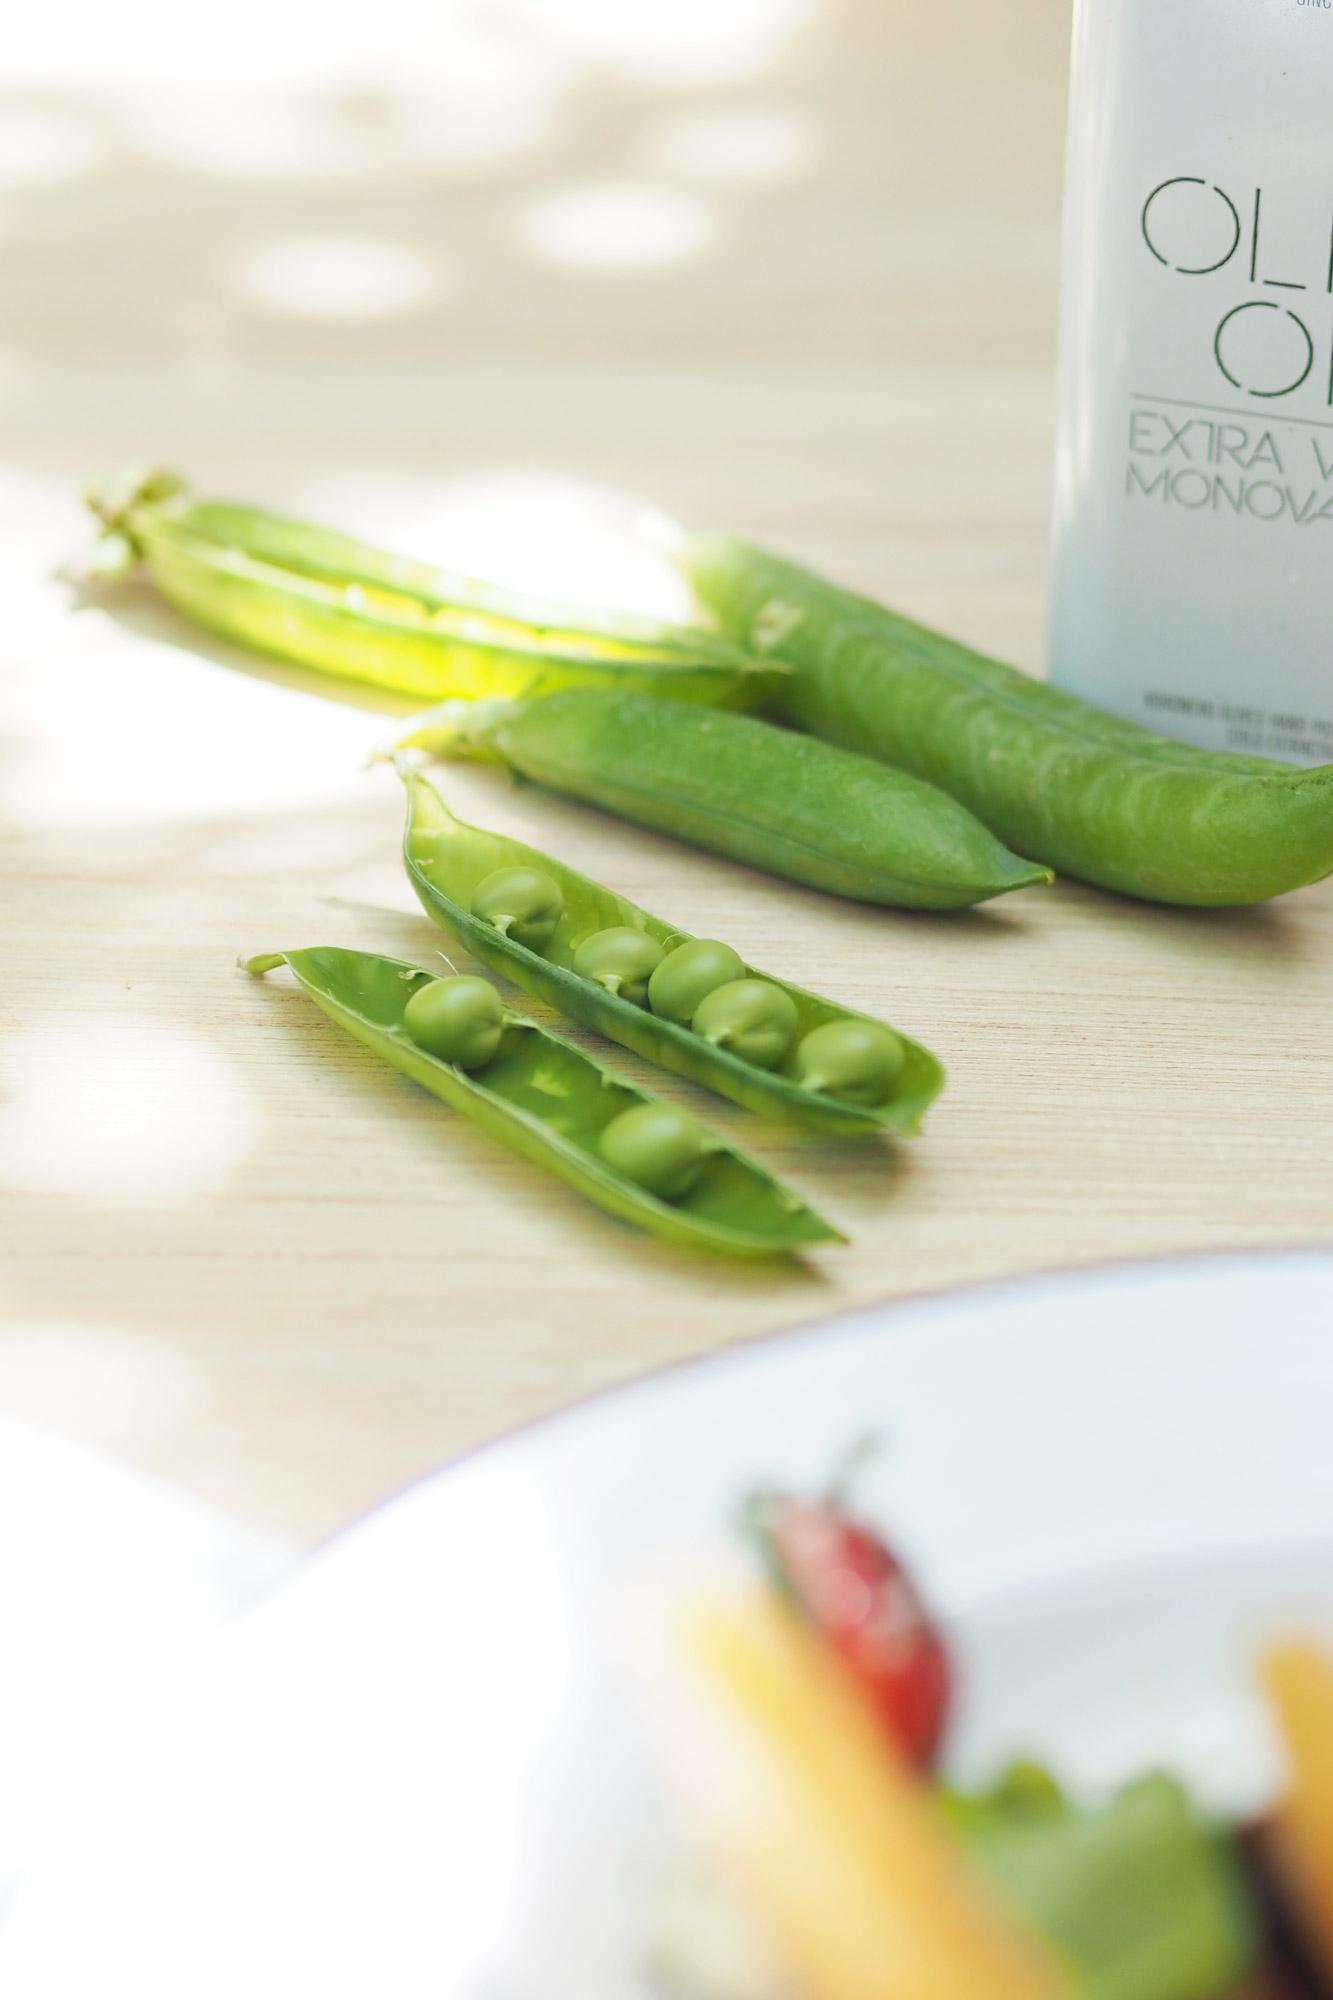 {Recette} Salade melon, fraise, feta, petits pois, olives - Tippy.fr